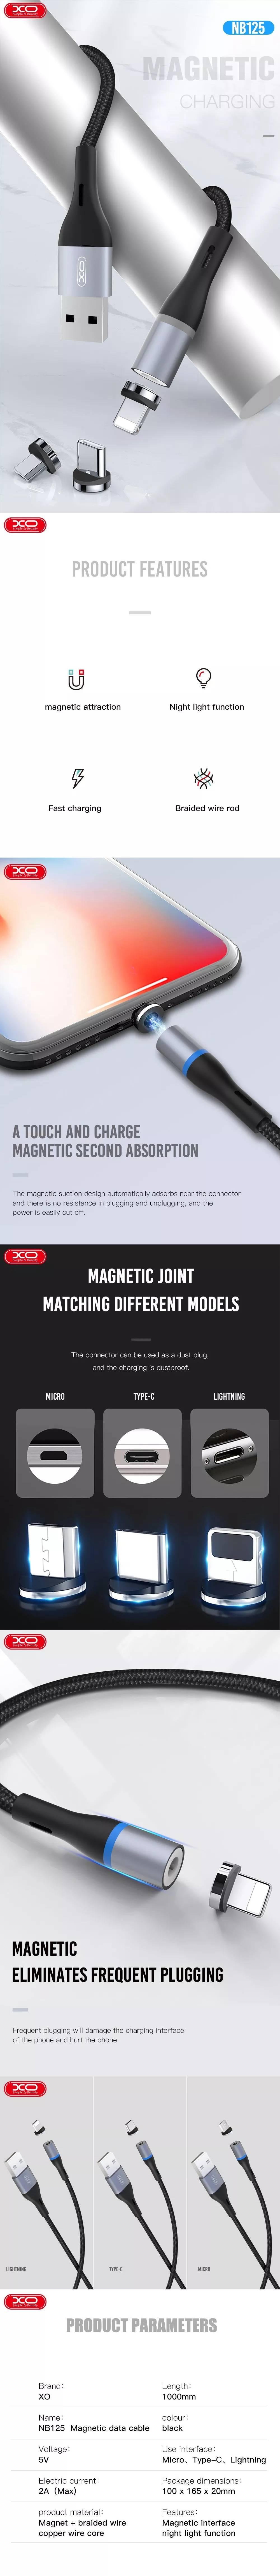 XO cable magnetic NB125 USB - Lightning 1,0 m 2A black